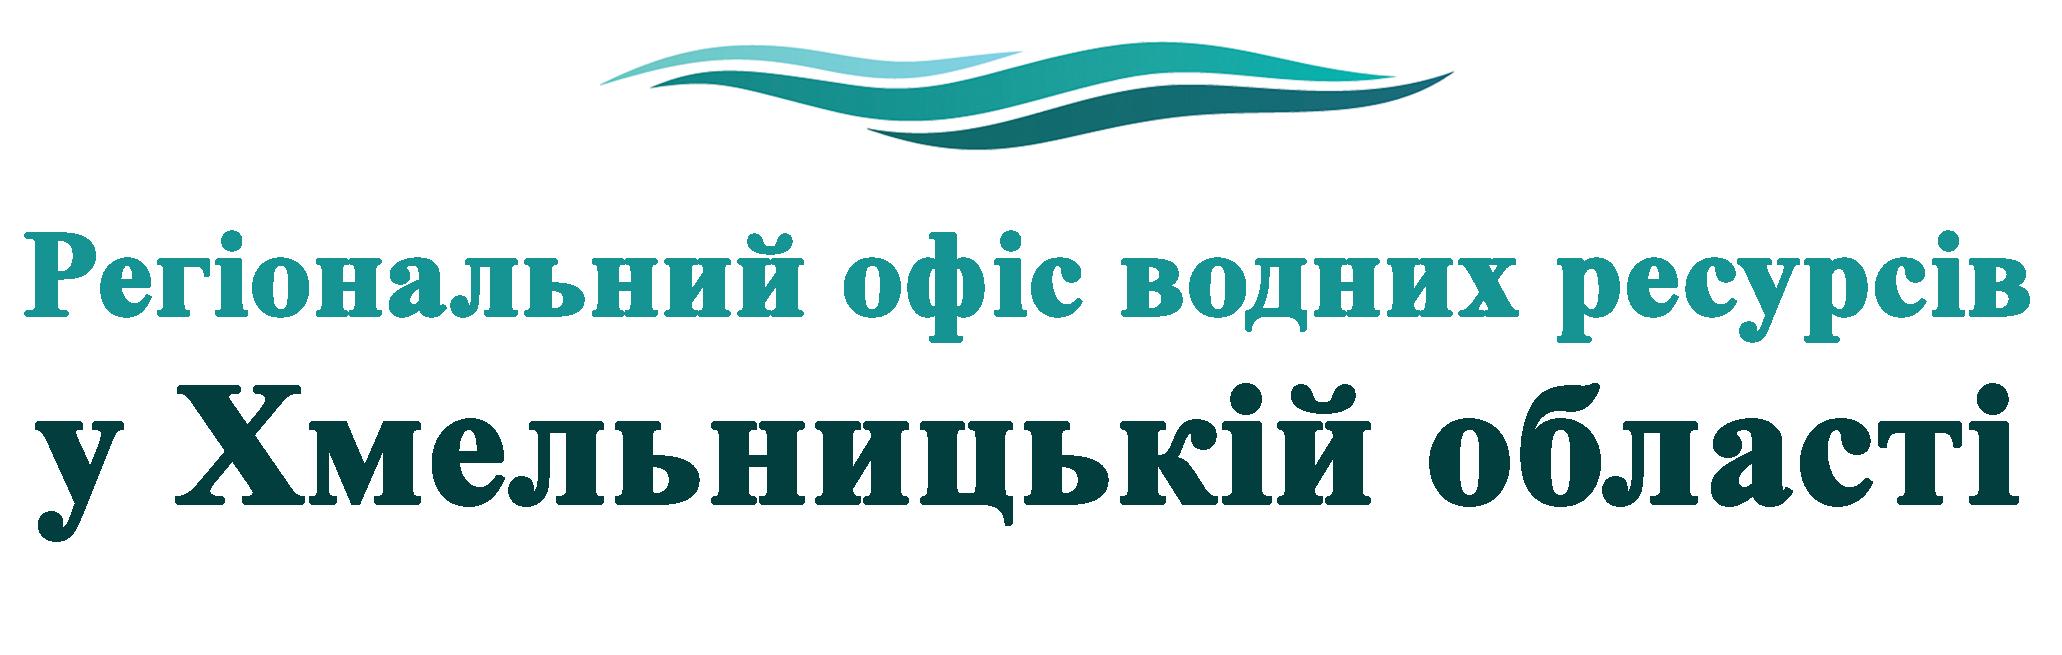 РОВР у Хмельницькій області